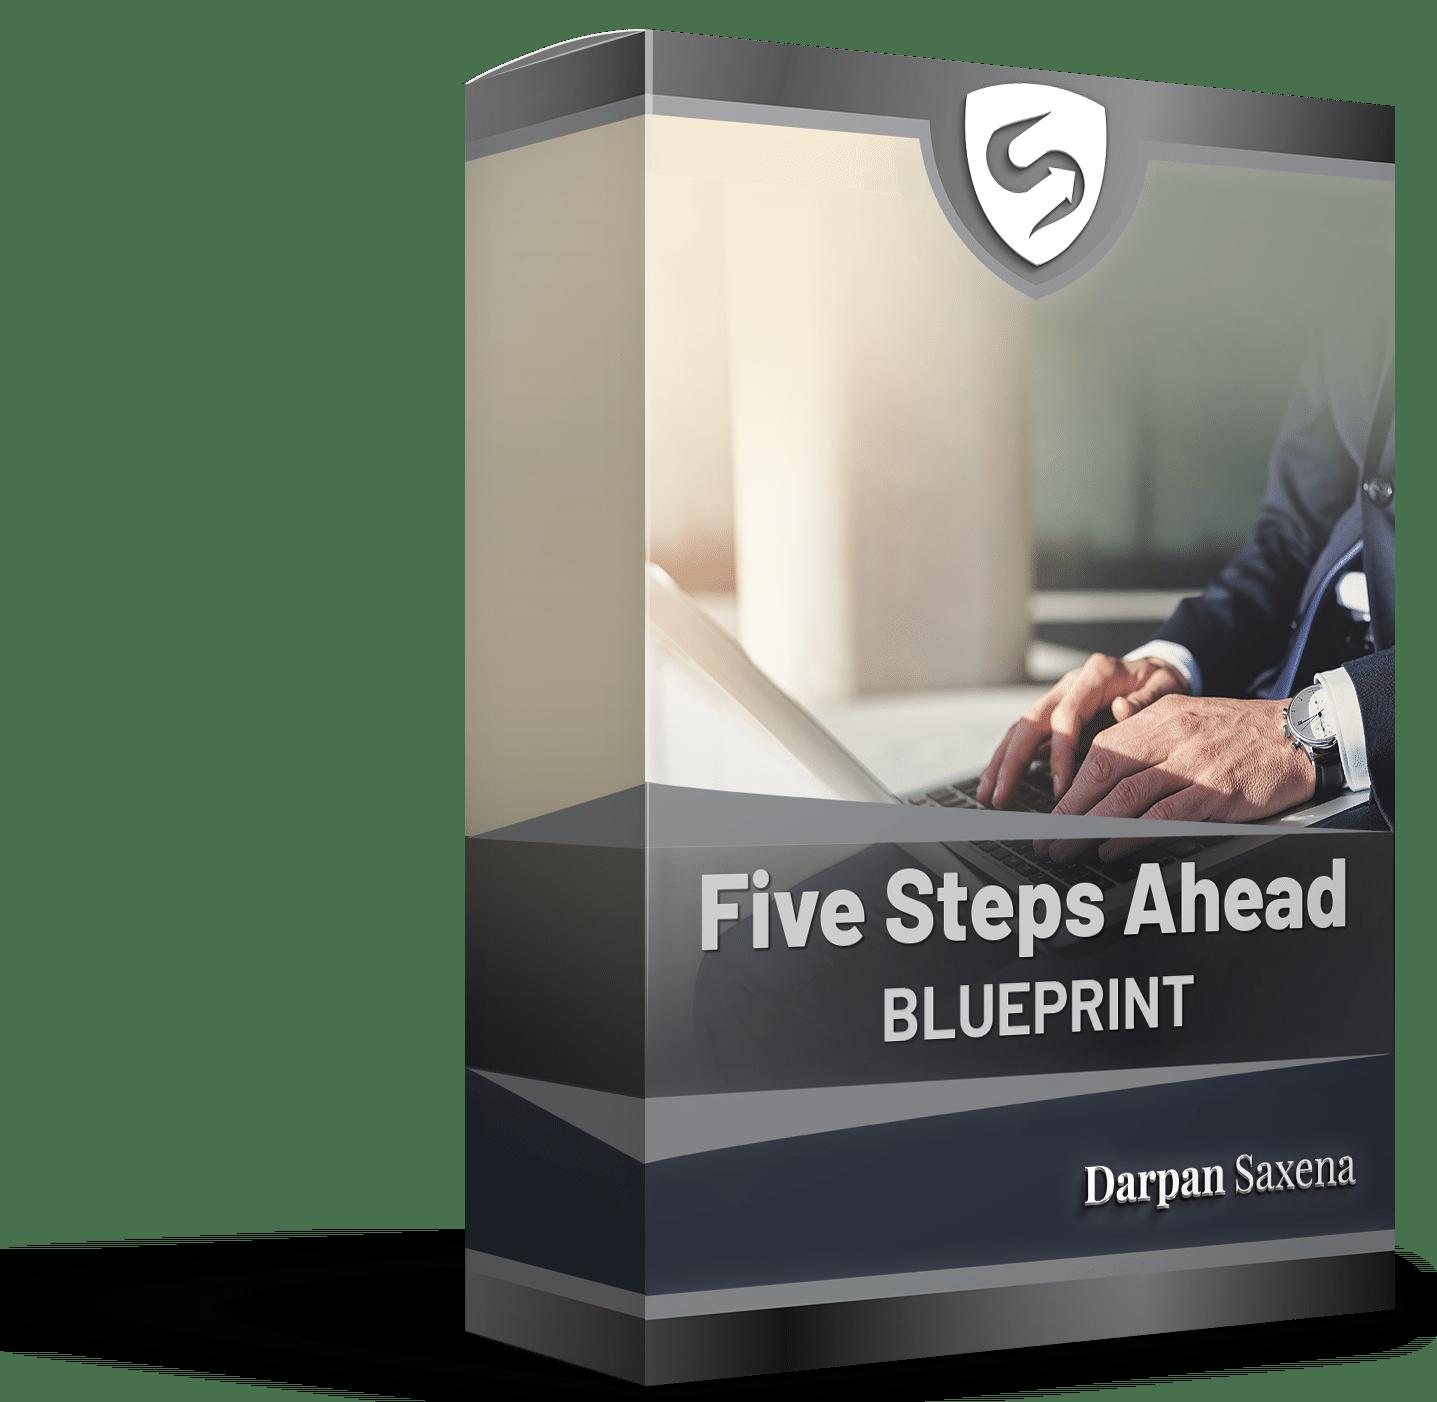 FSABlueprintBox